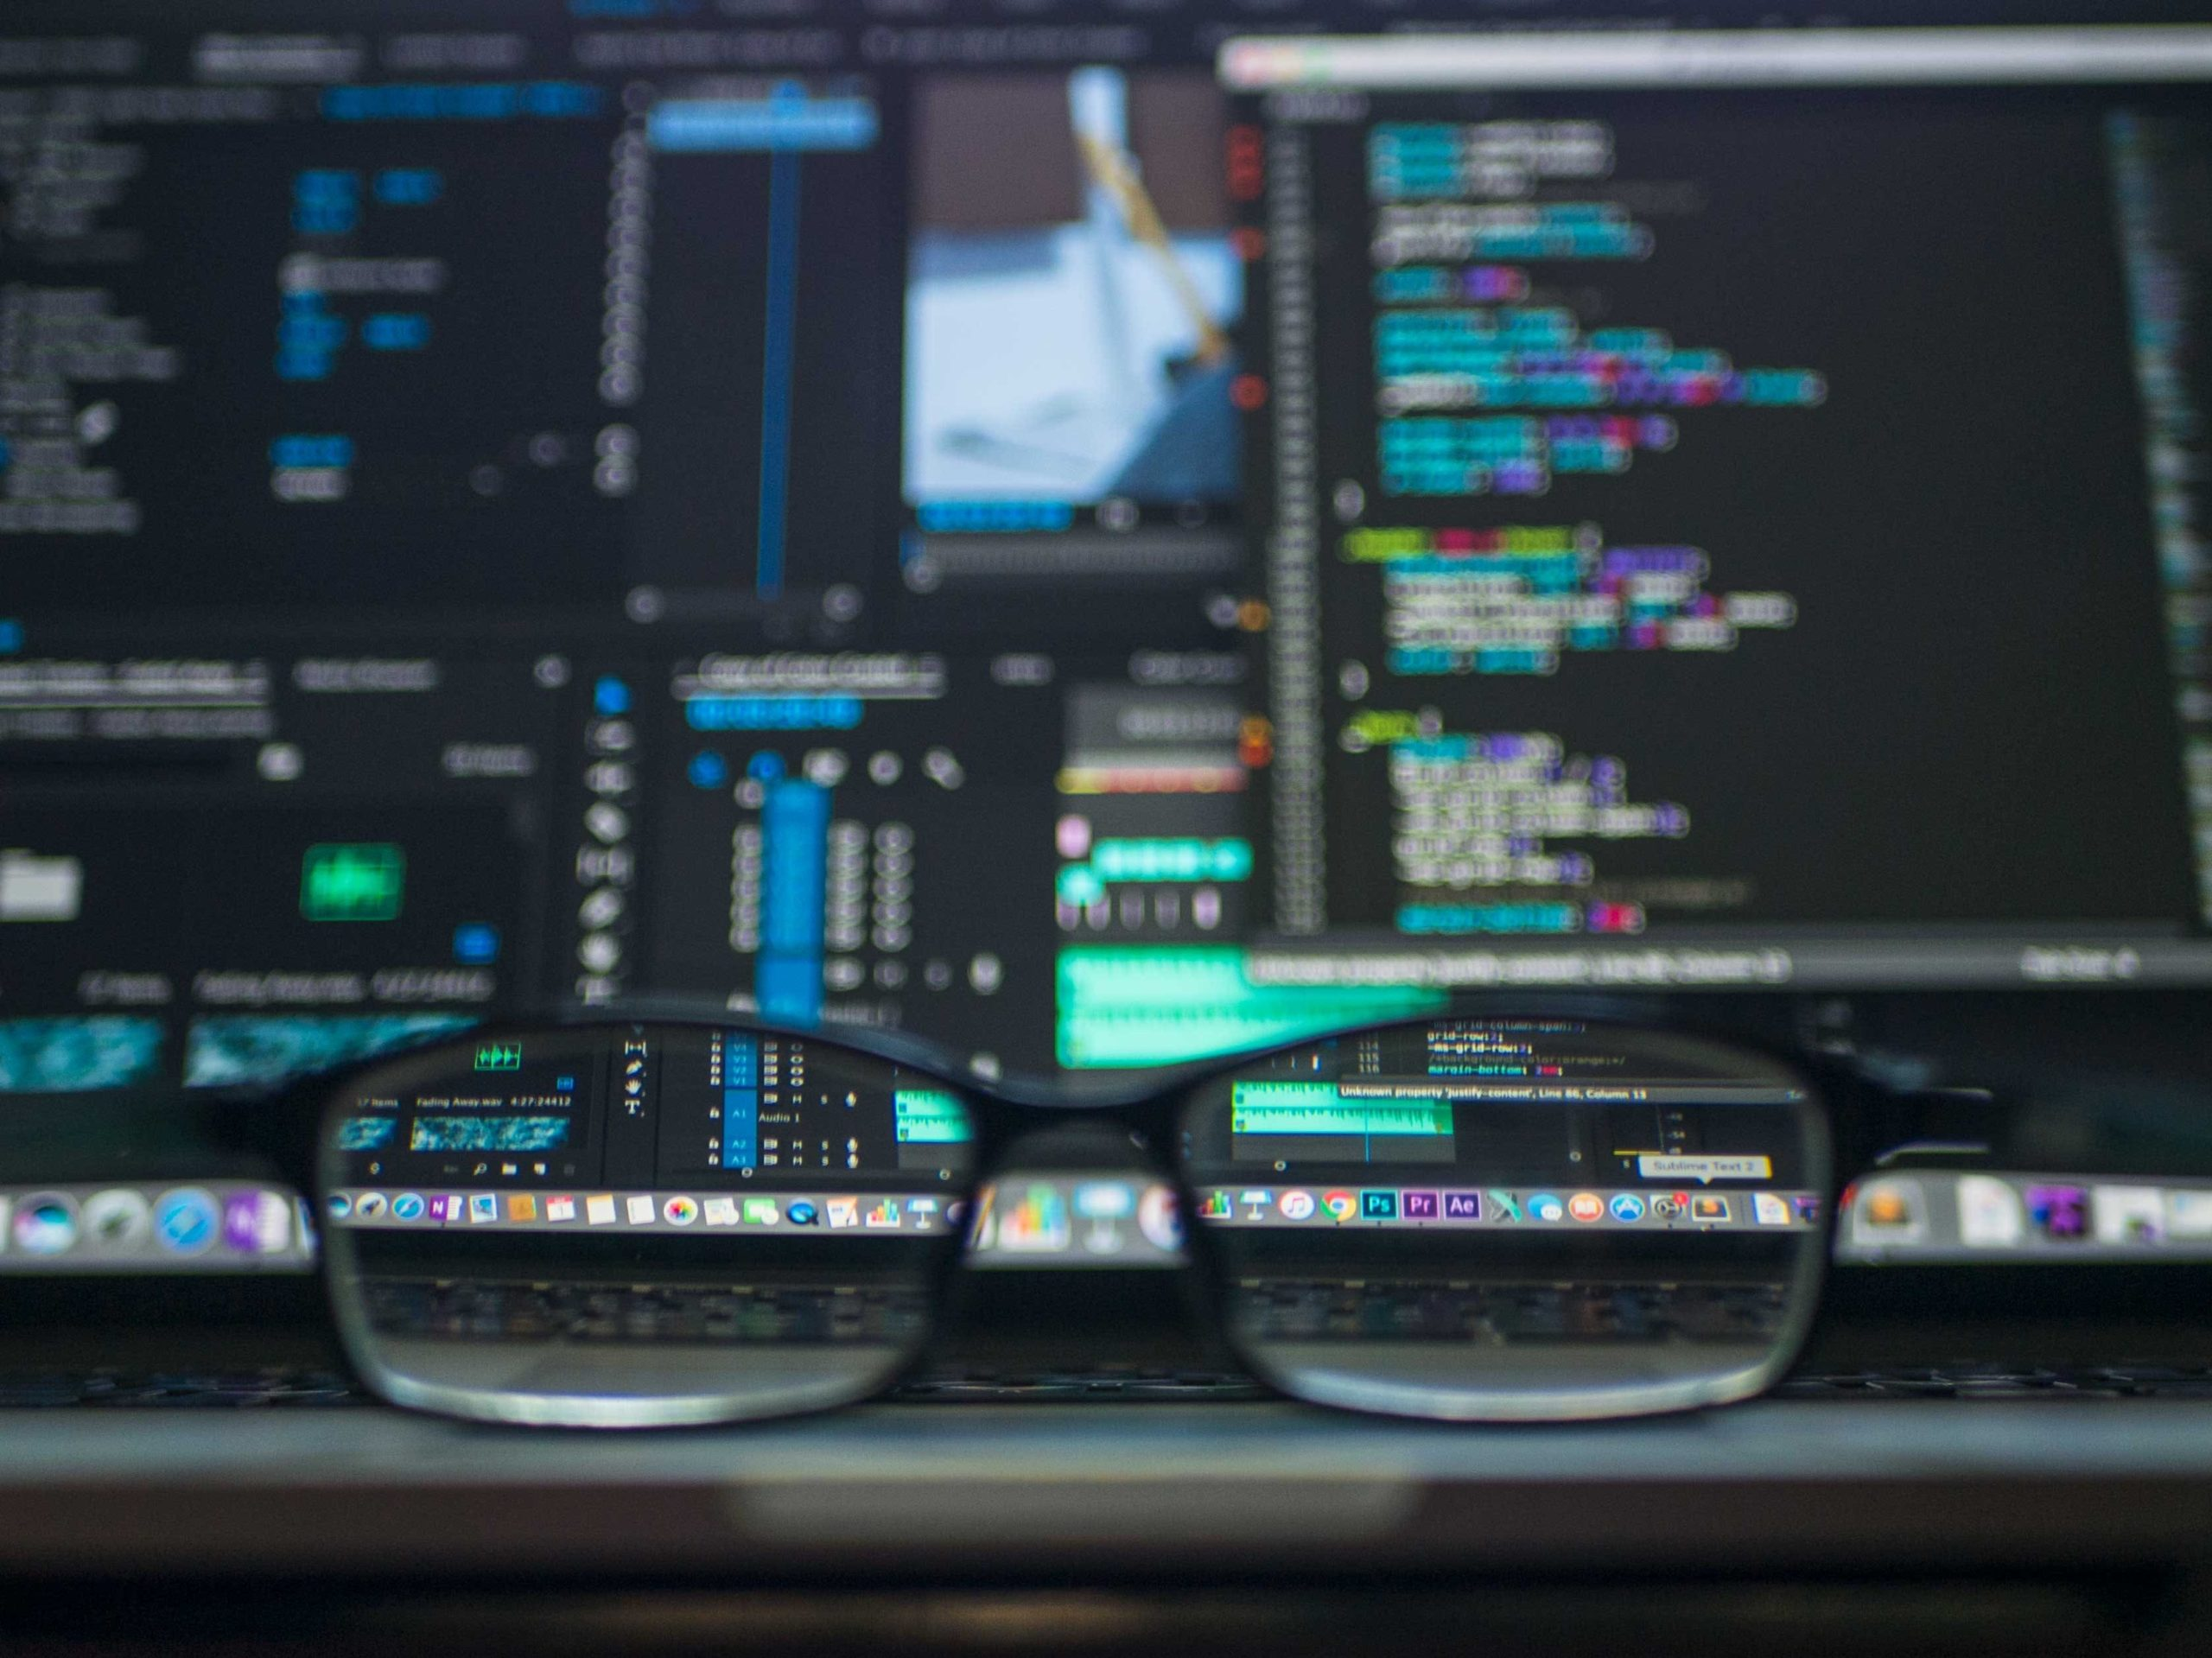 Microsoft lanceert gratis app om machine learning modellen te trainen